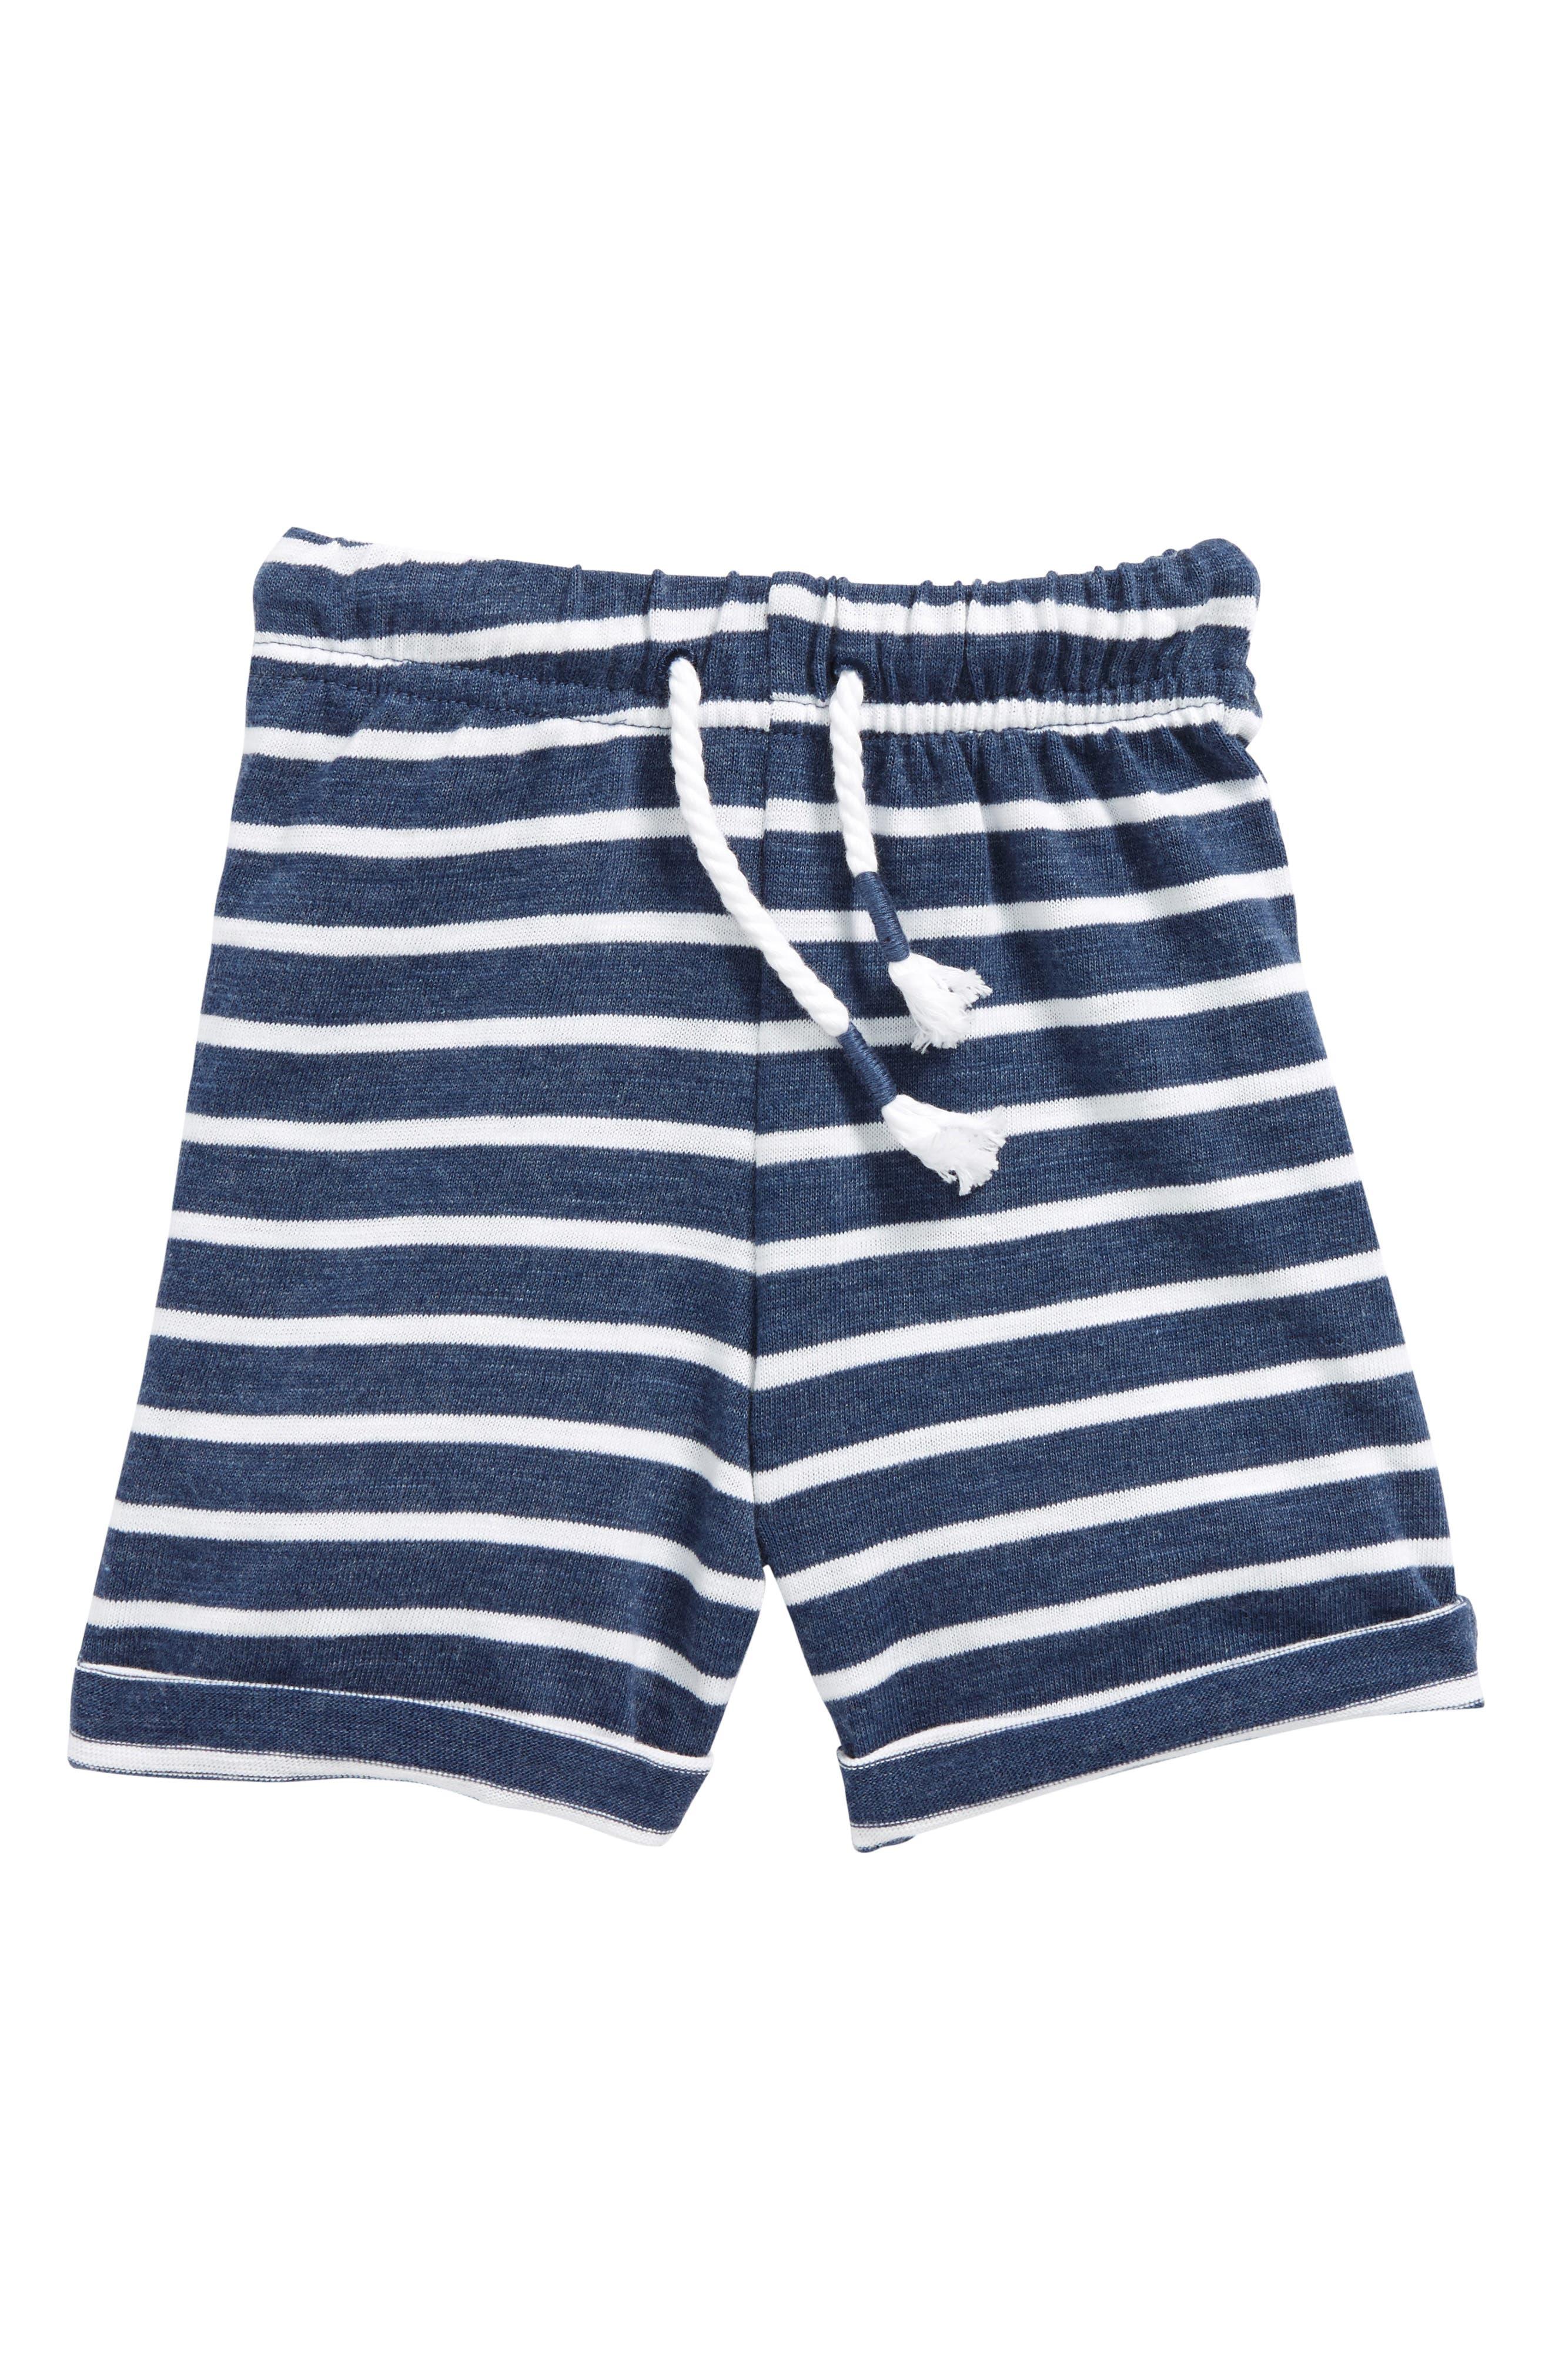 Stripe Shorts,                             Main thumbnail 1, color,                             Navy Striped